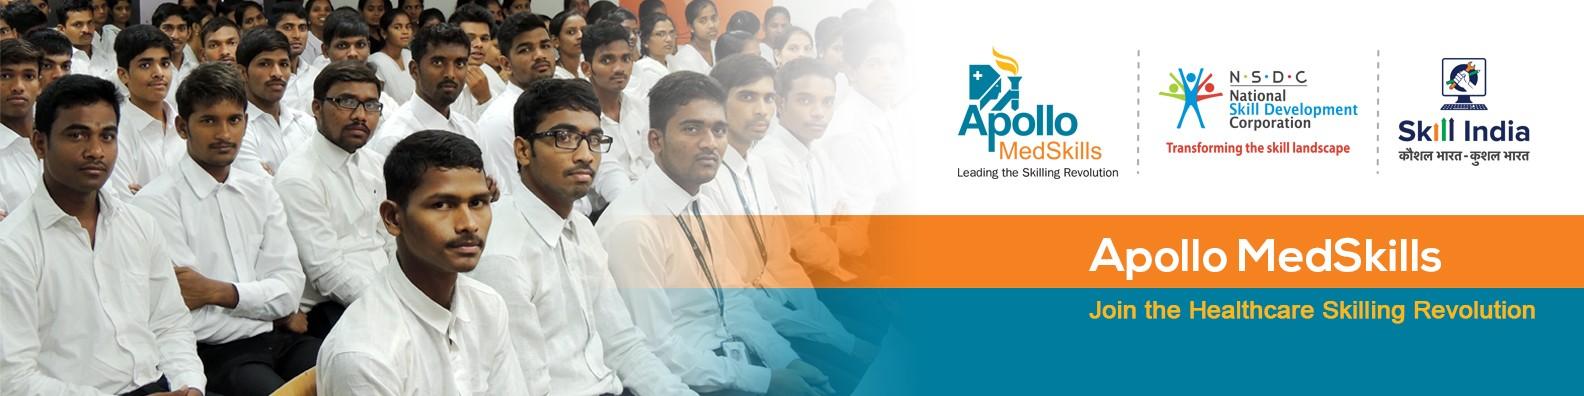 Apollo MedSkills Limited | LinkedIn